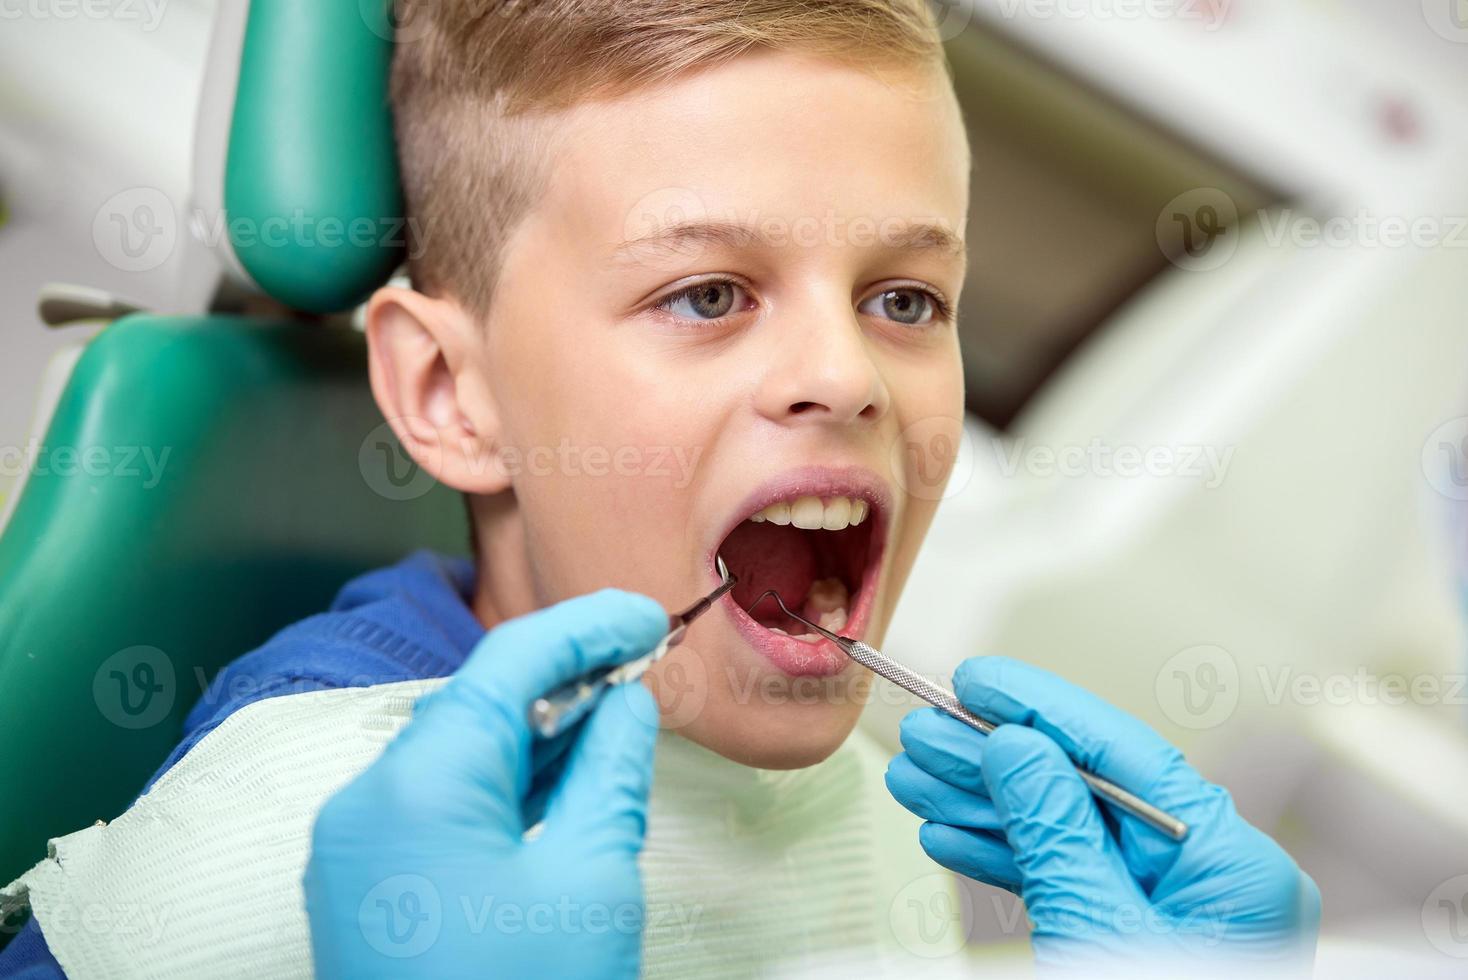 Zahnarzt foto